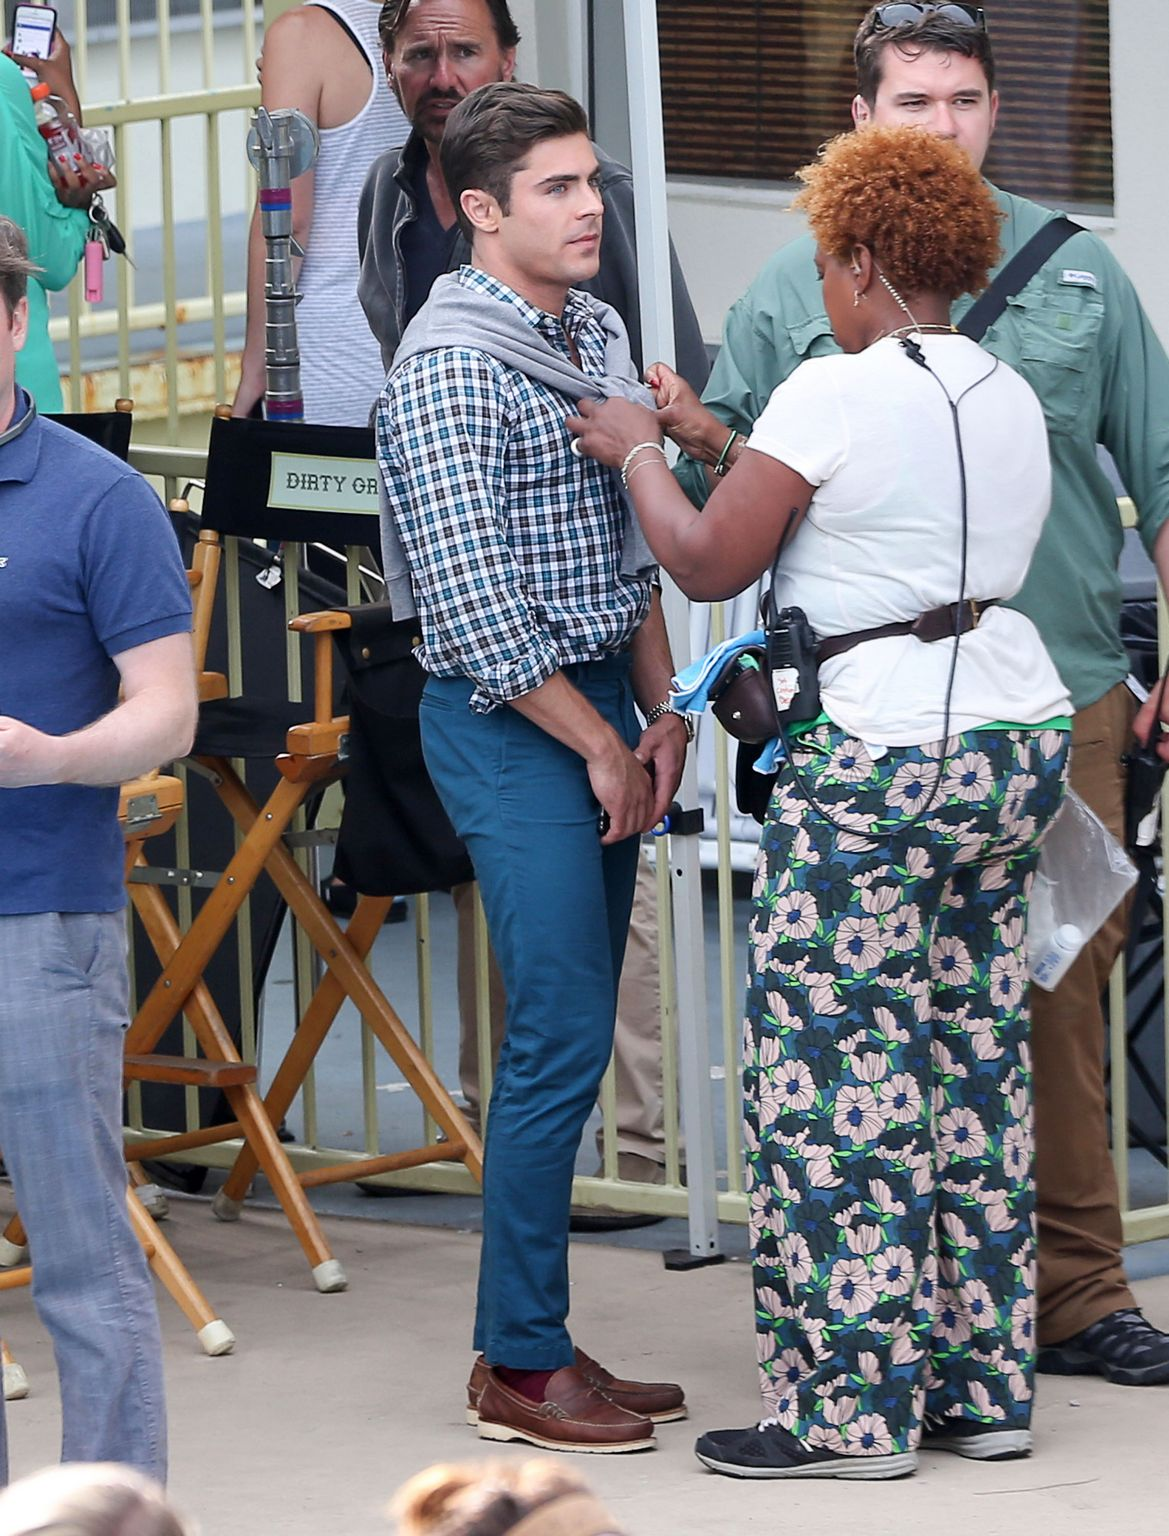 Sami Miro Visits BF Zac Efron On The Set Of Dirty Grandpa-4